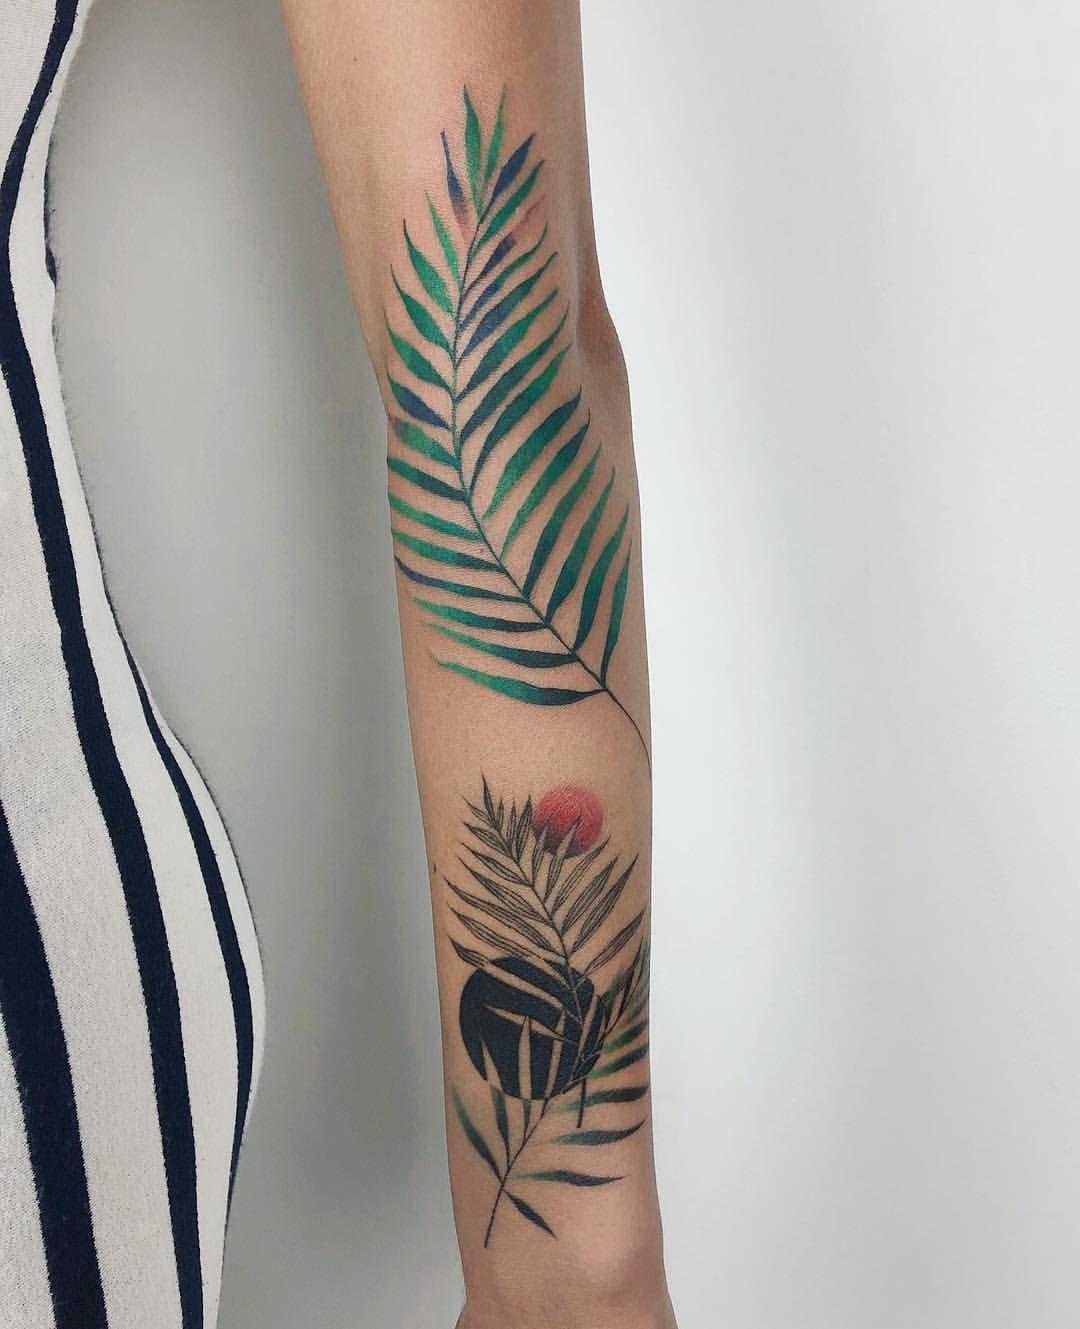 Karolina Skulska Skvlska Instagram Posts Videos Stories Picoji Colorful Palm Leaf Next To Super Nice W Elegant Tattoos Palm Tattoos Arm Tattoo Leaves Your favourite piece from our refreshed classic collection? palm tattoos arm tattoo